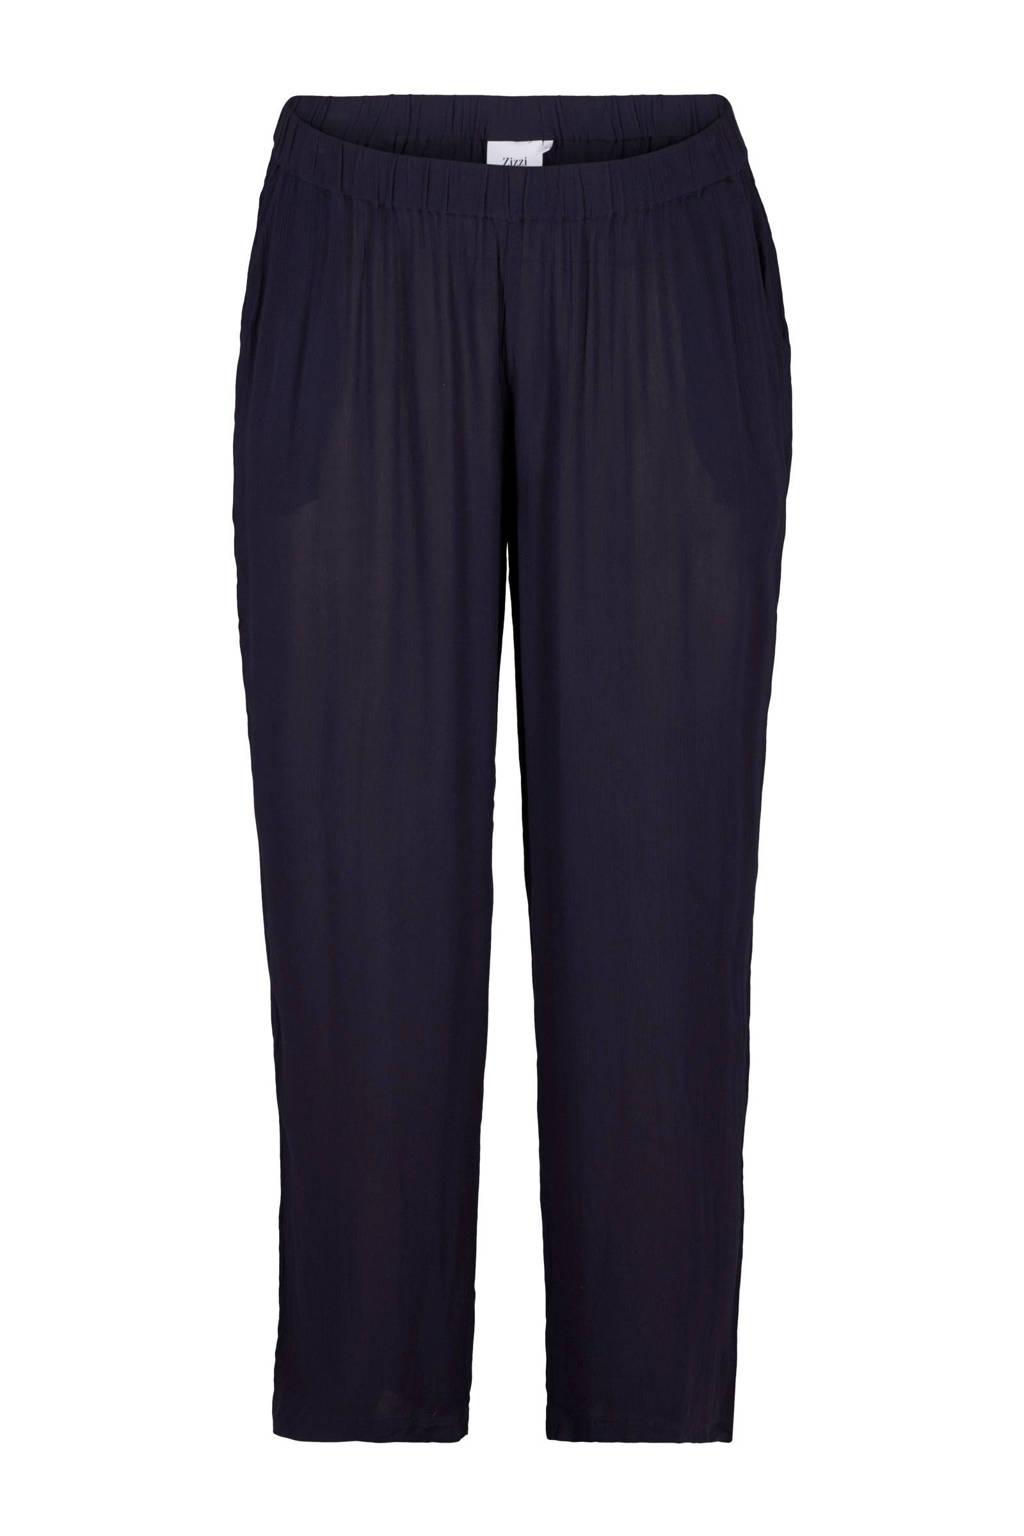 Zizzi loose fit broek donkerblauw, Donkerblauw